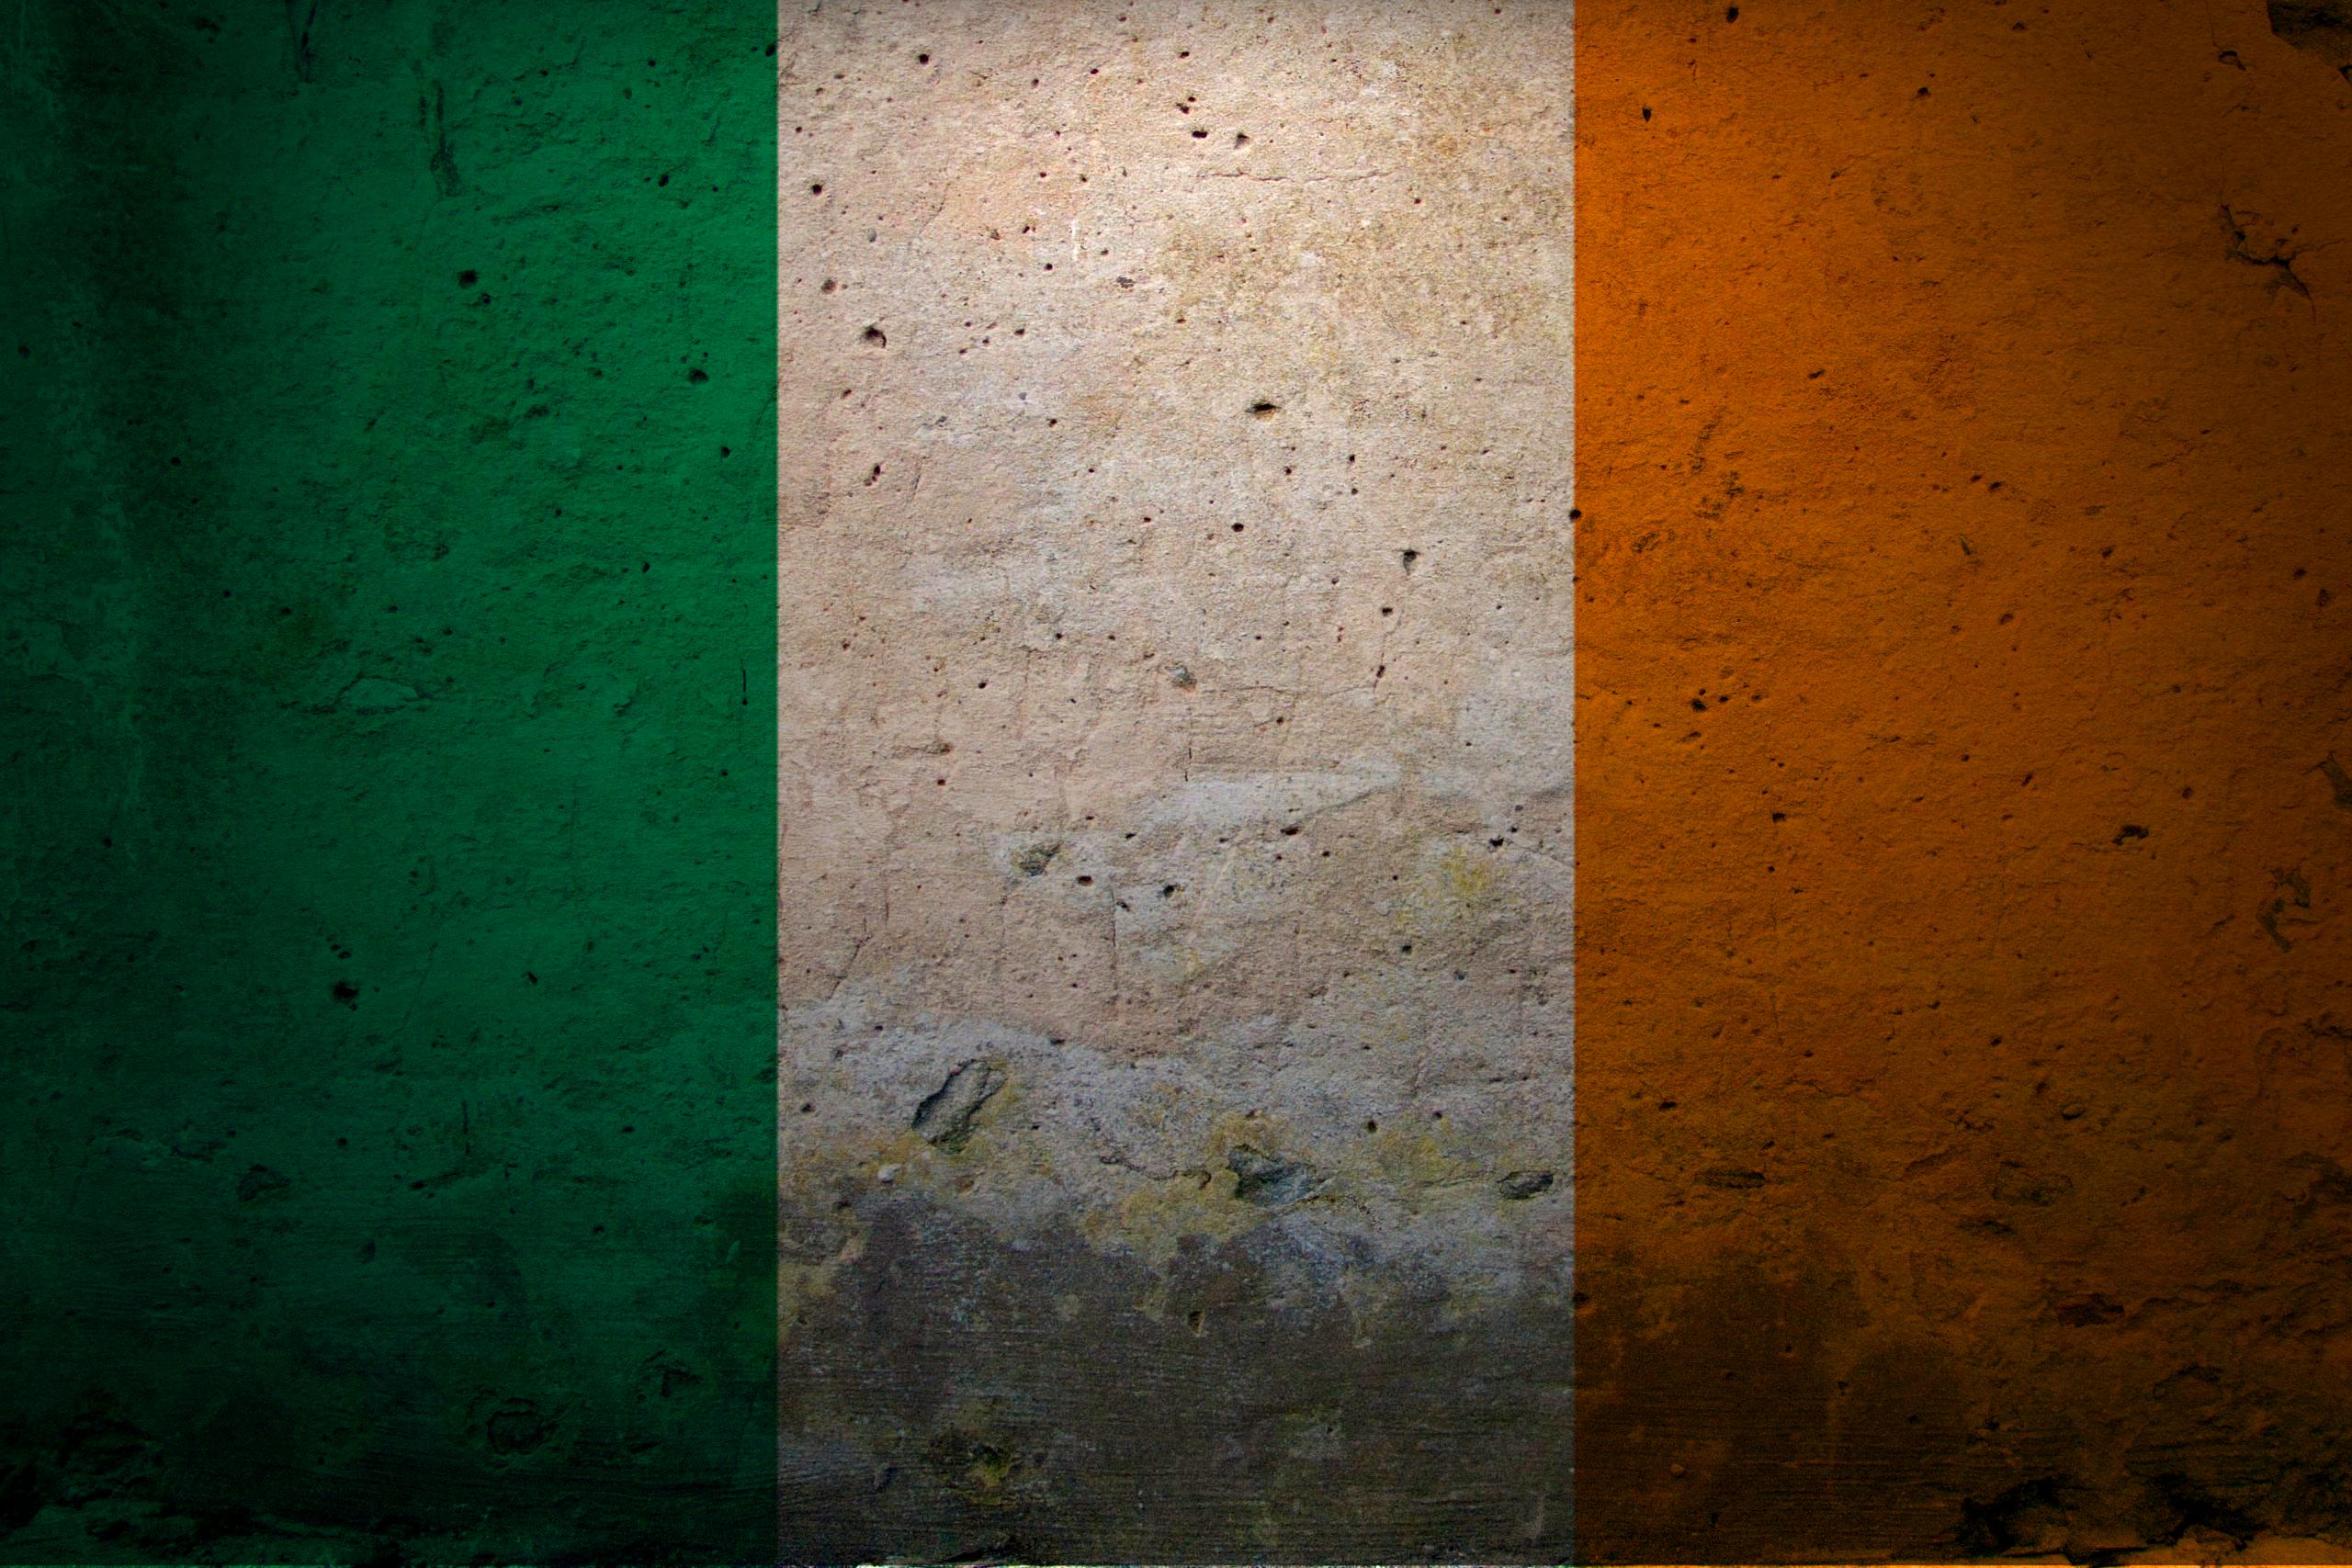 Flag of Ireland HD Wallpaper Background Image 2560x1707 ID 2560x1707